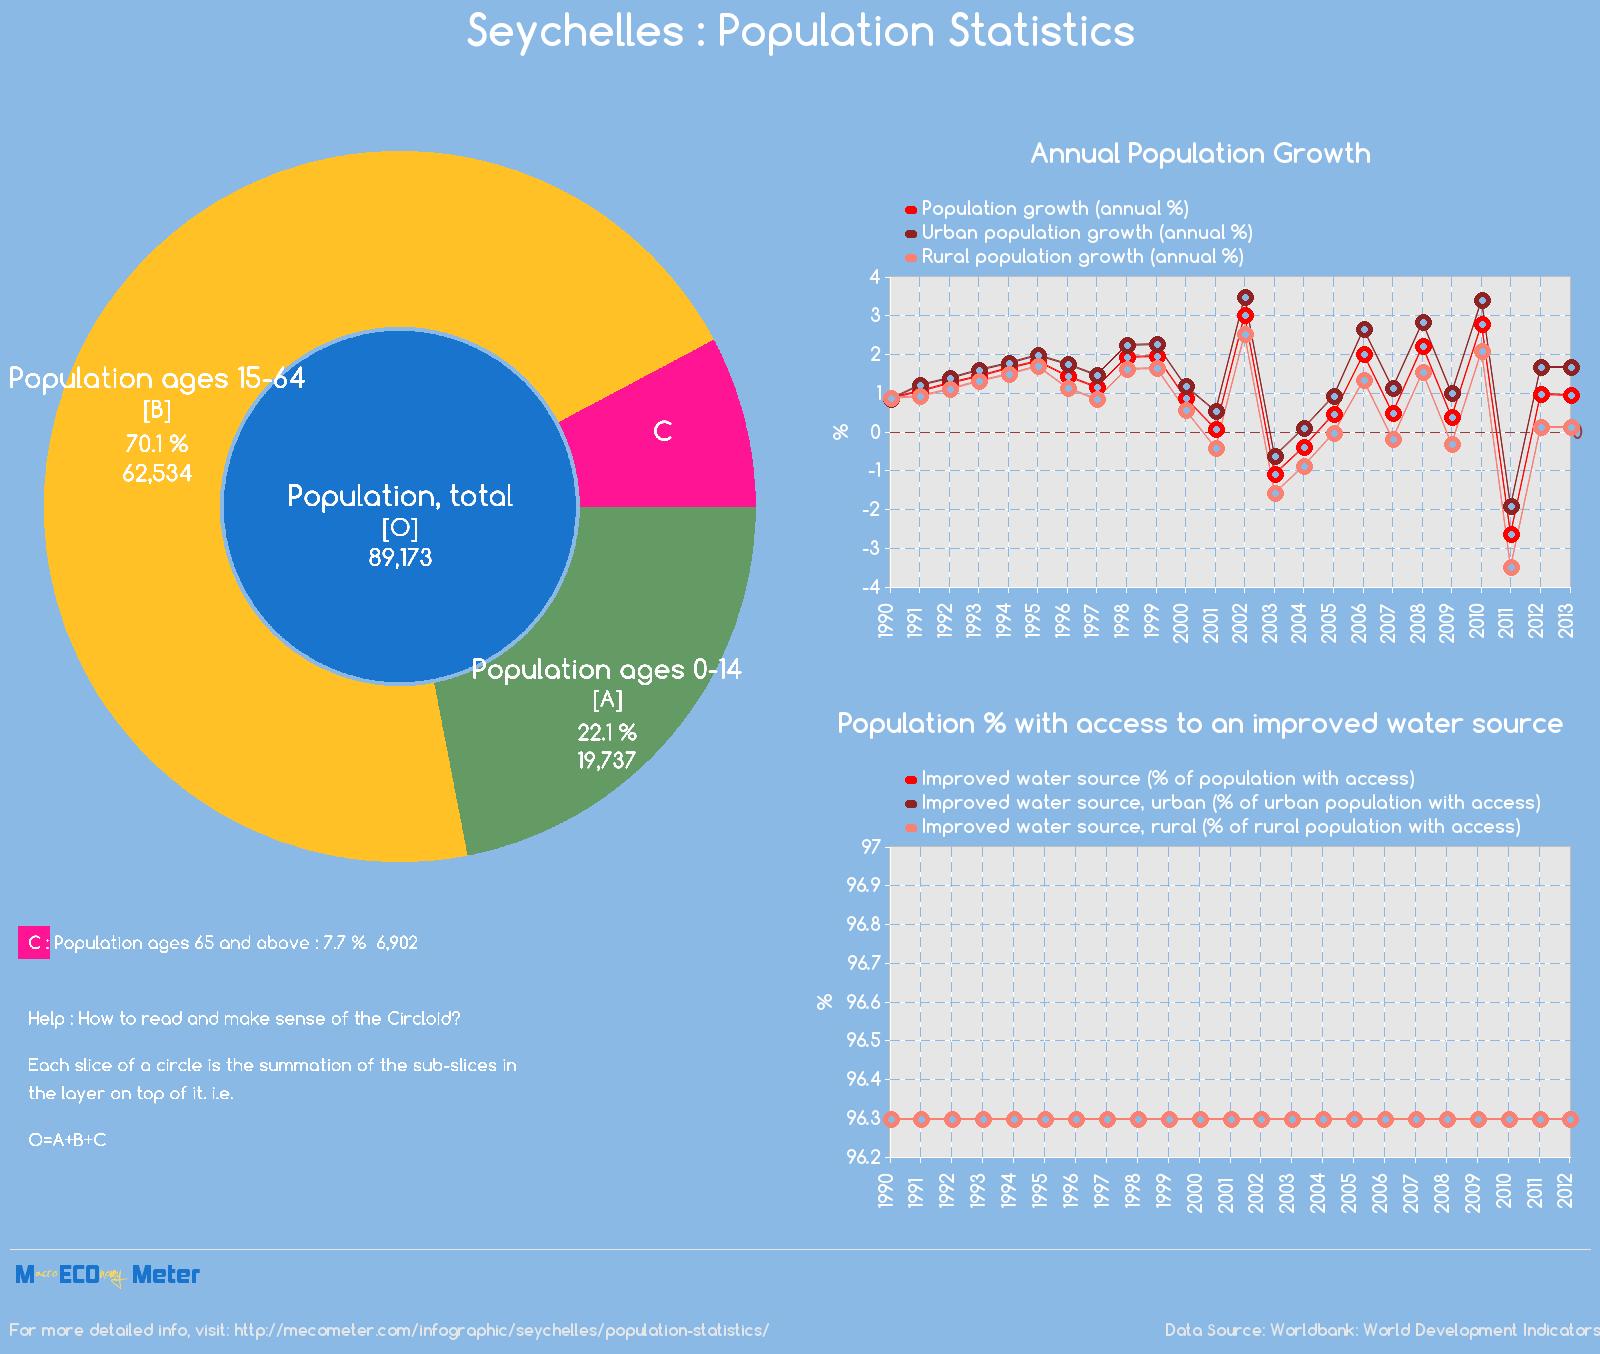 Seychelles : Population Statistics